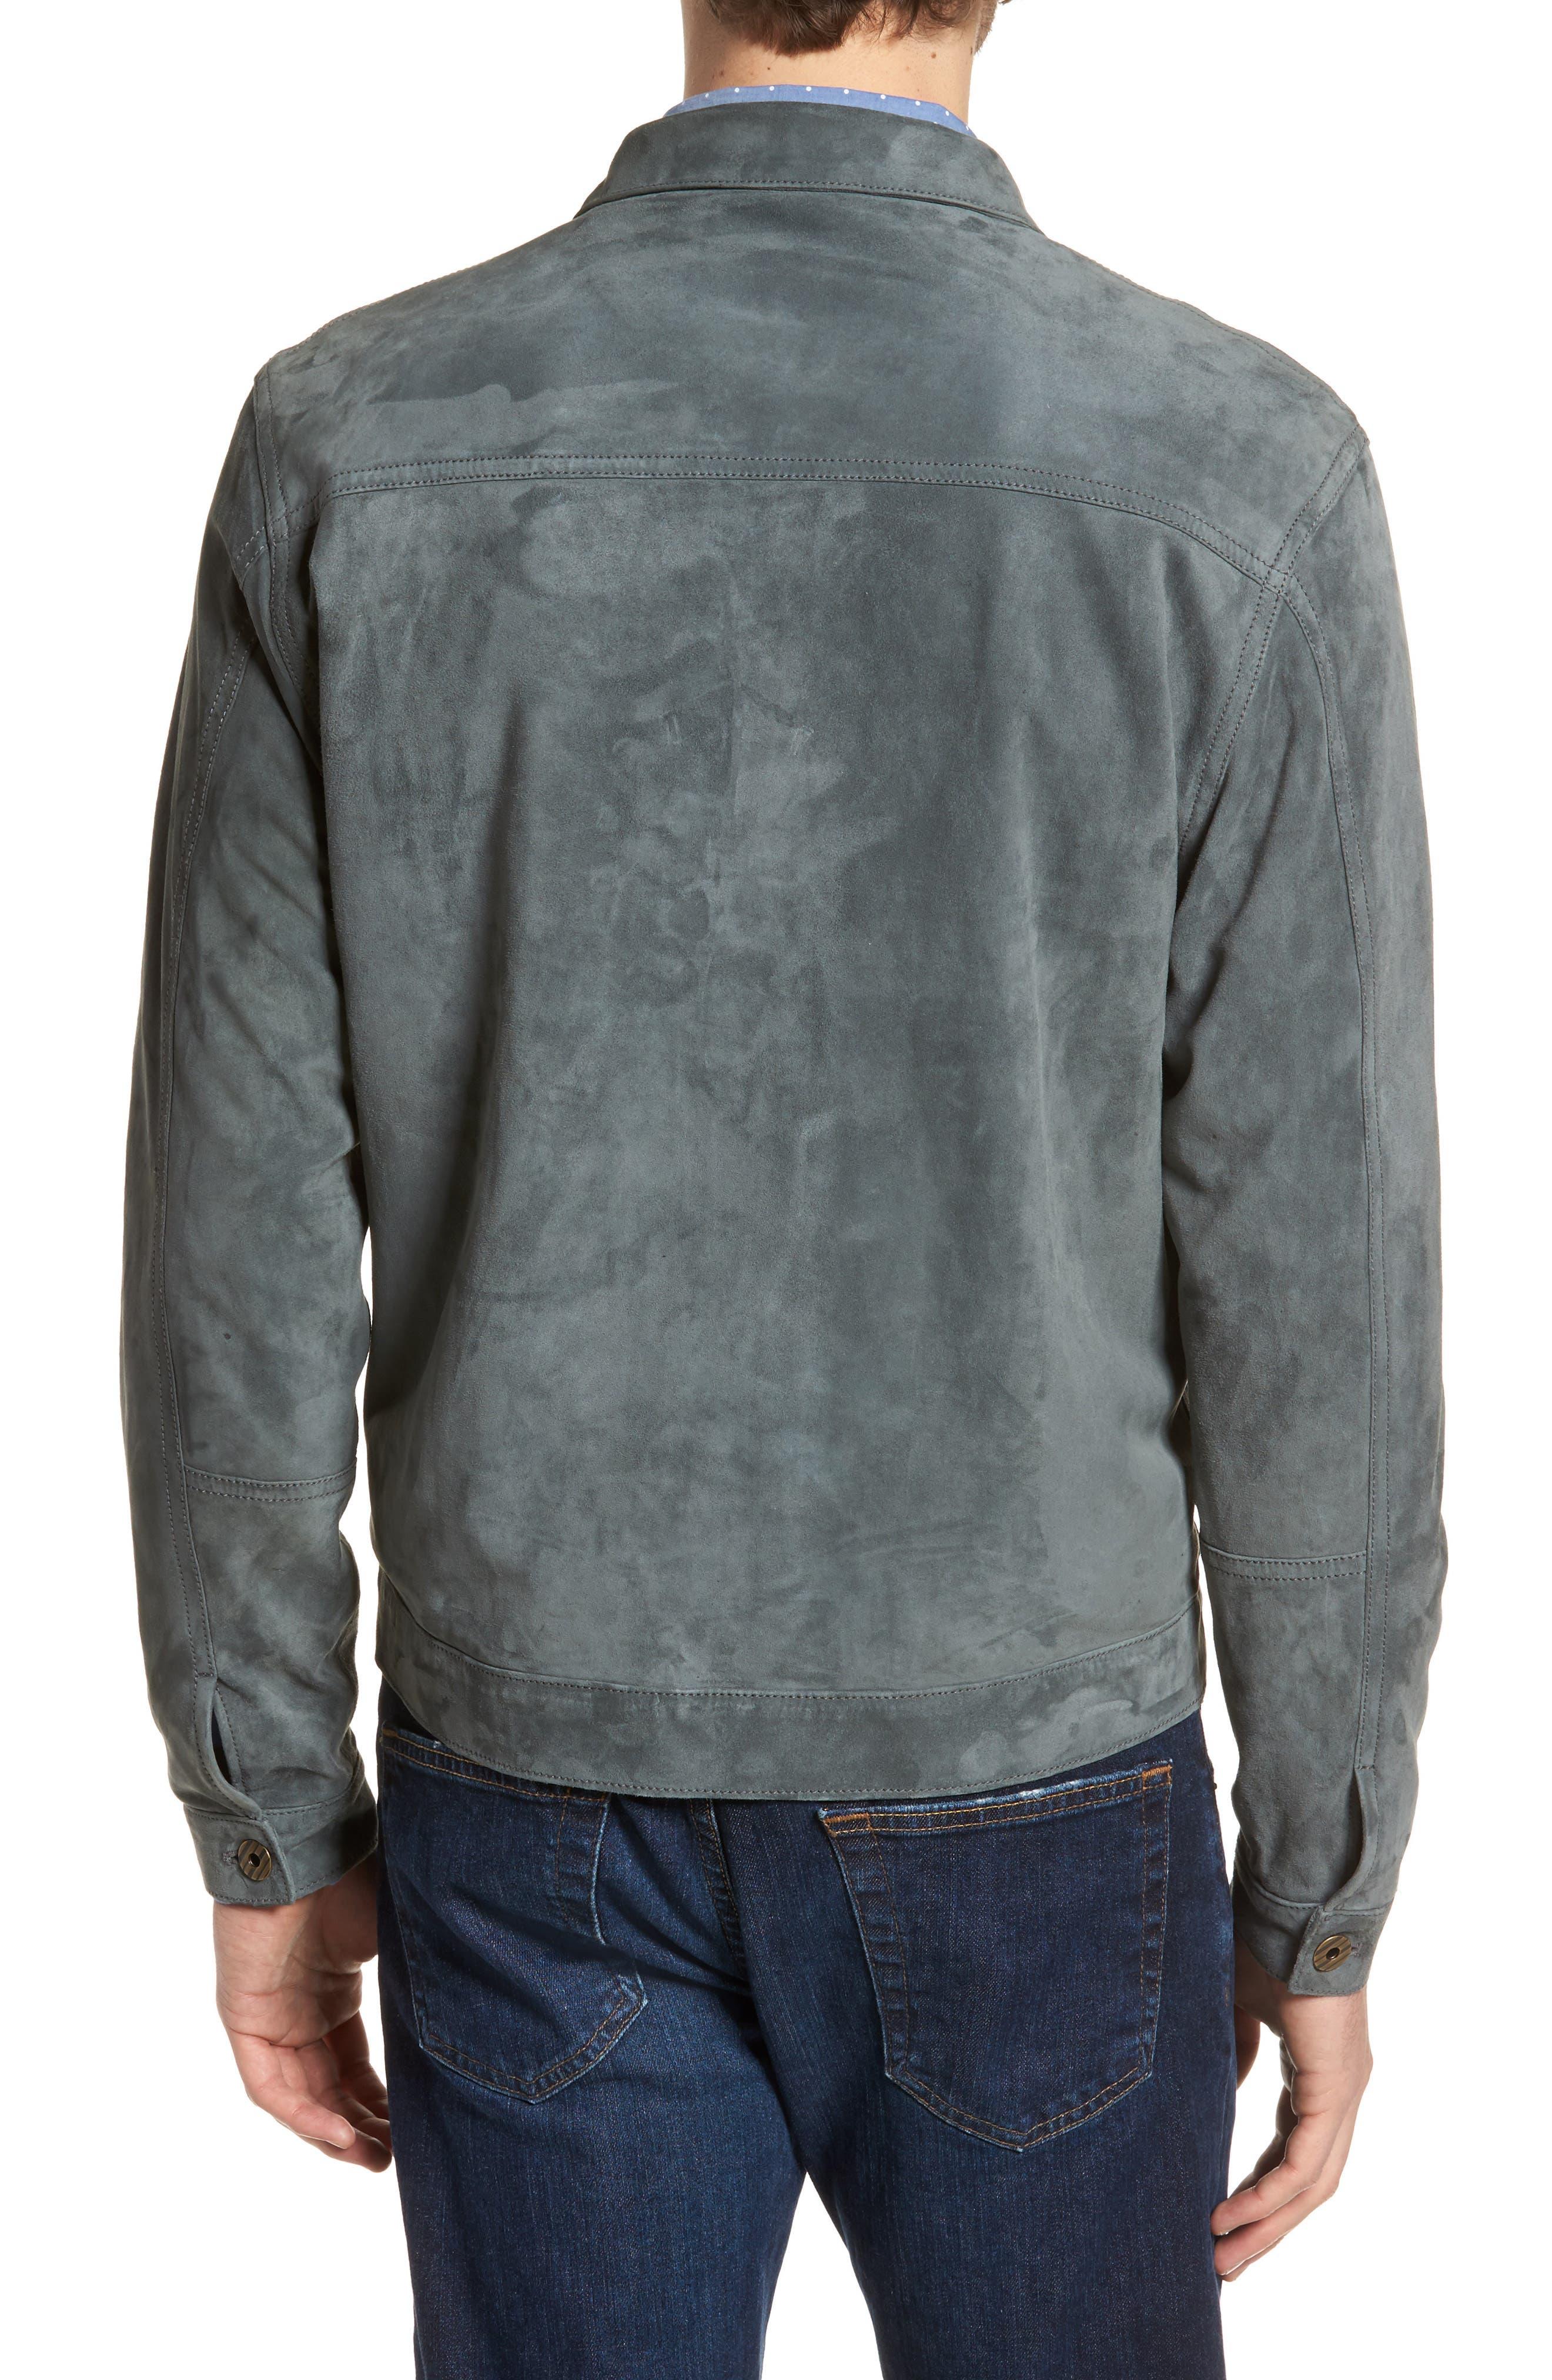 Cullen Suede Jacket,                             Alternate thumbnail 2, color,                             Aspha